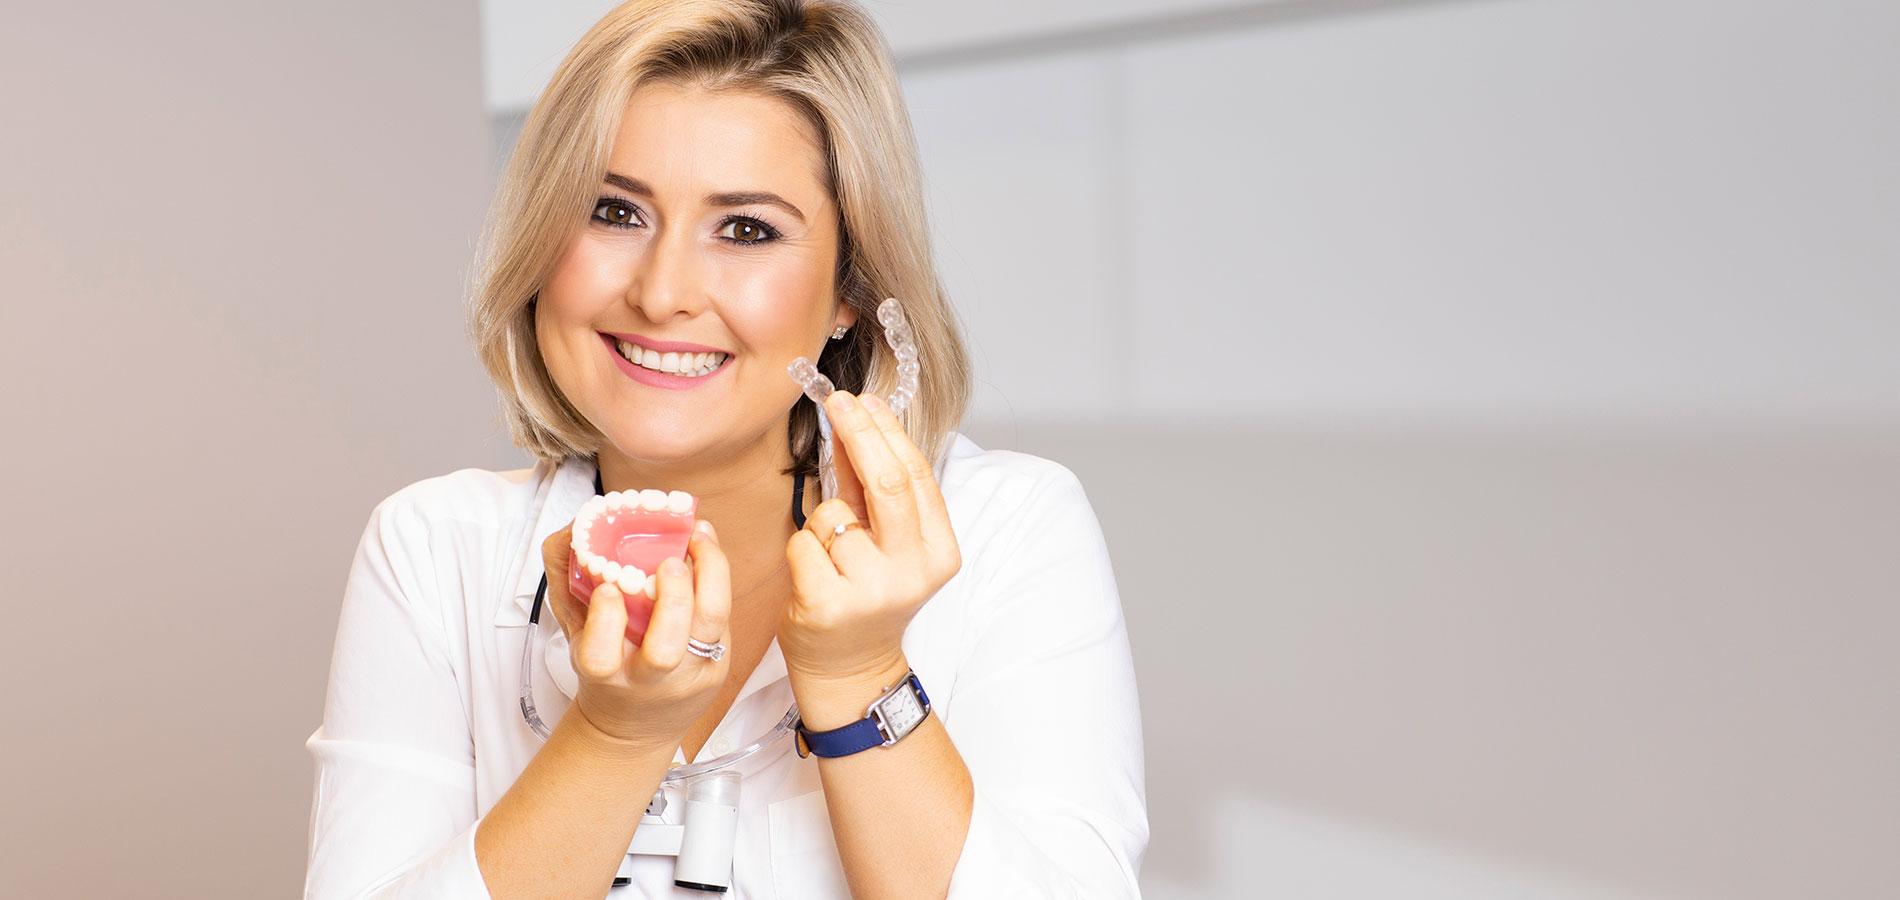 dorothee-jarleton-zahnarzt-praxis-koeln-Blog-Titelbild